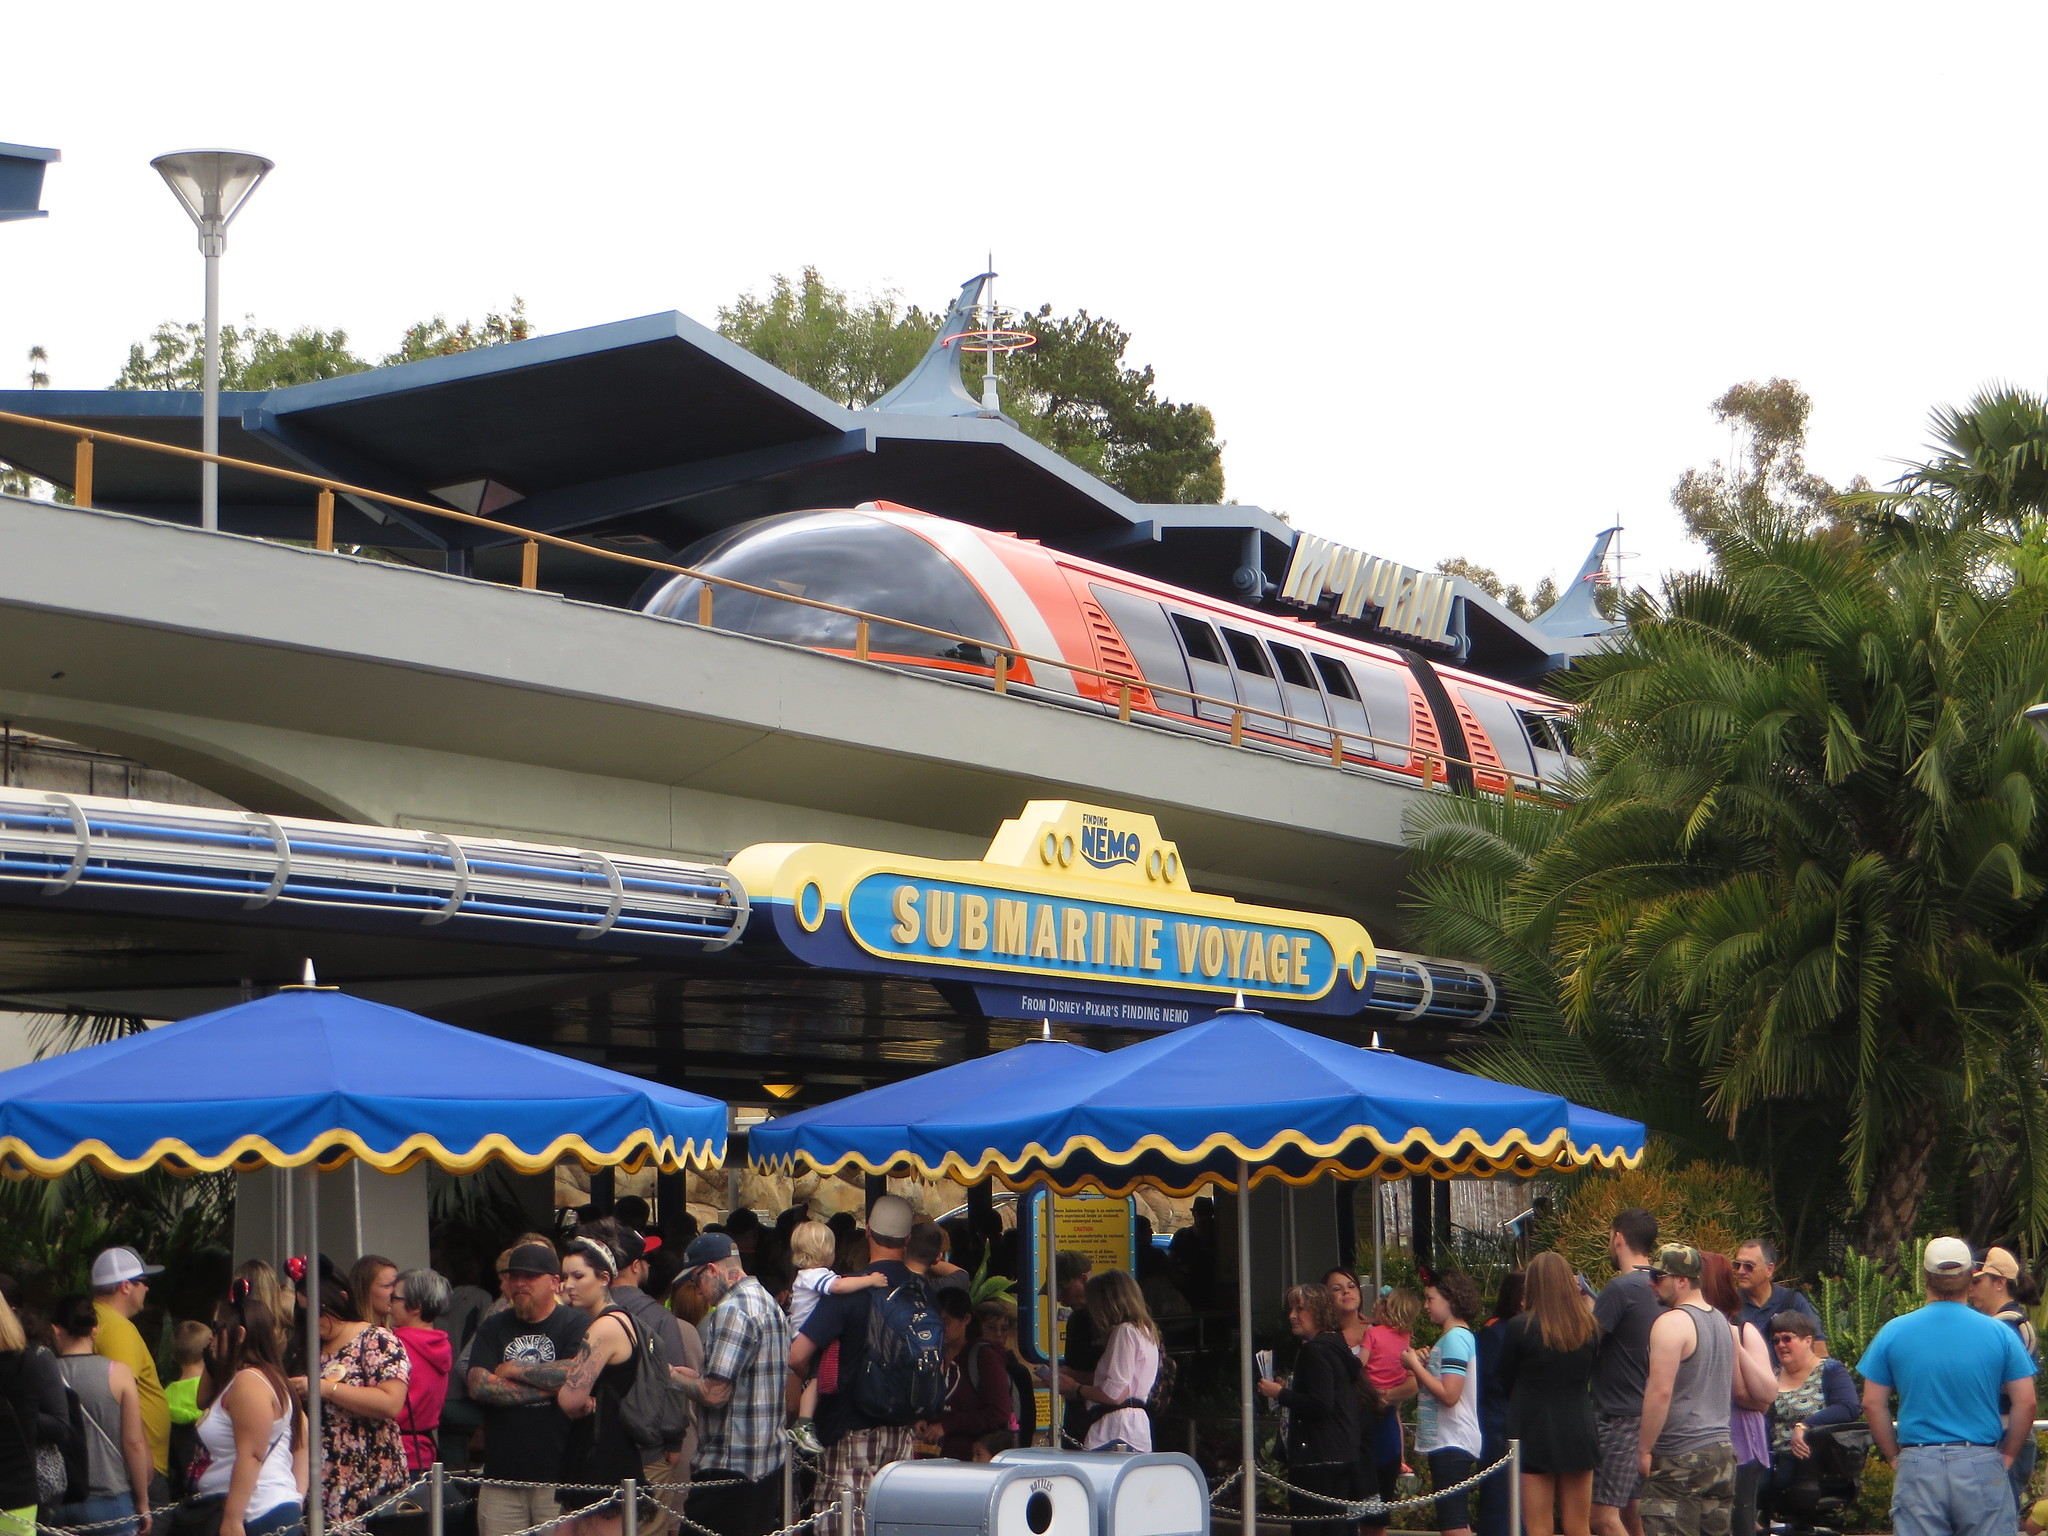 Nemo Submarine Voyage - Disneyland, CA